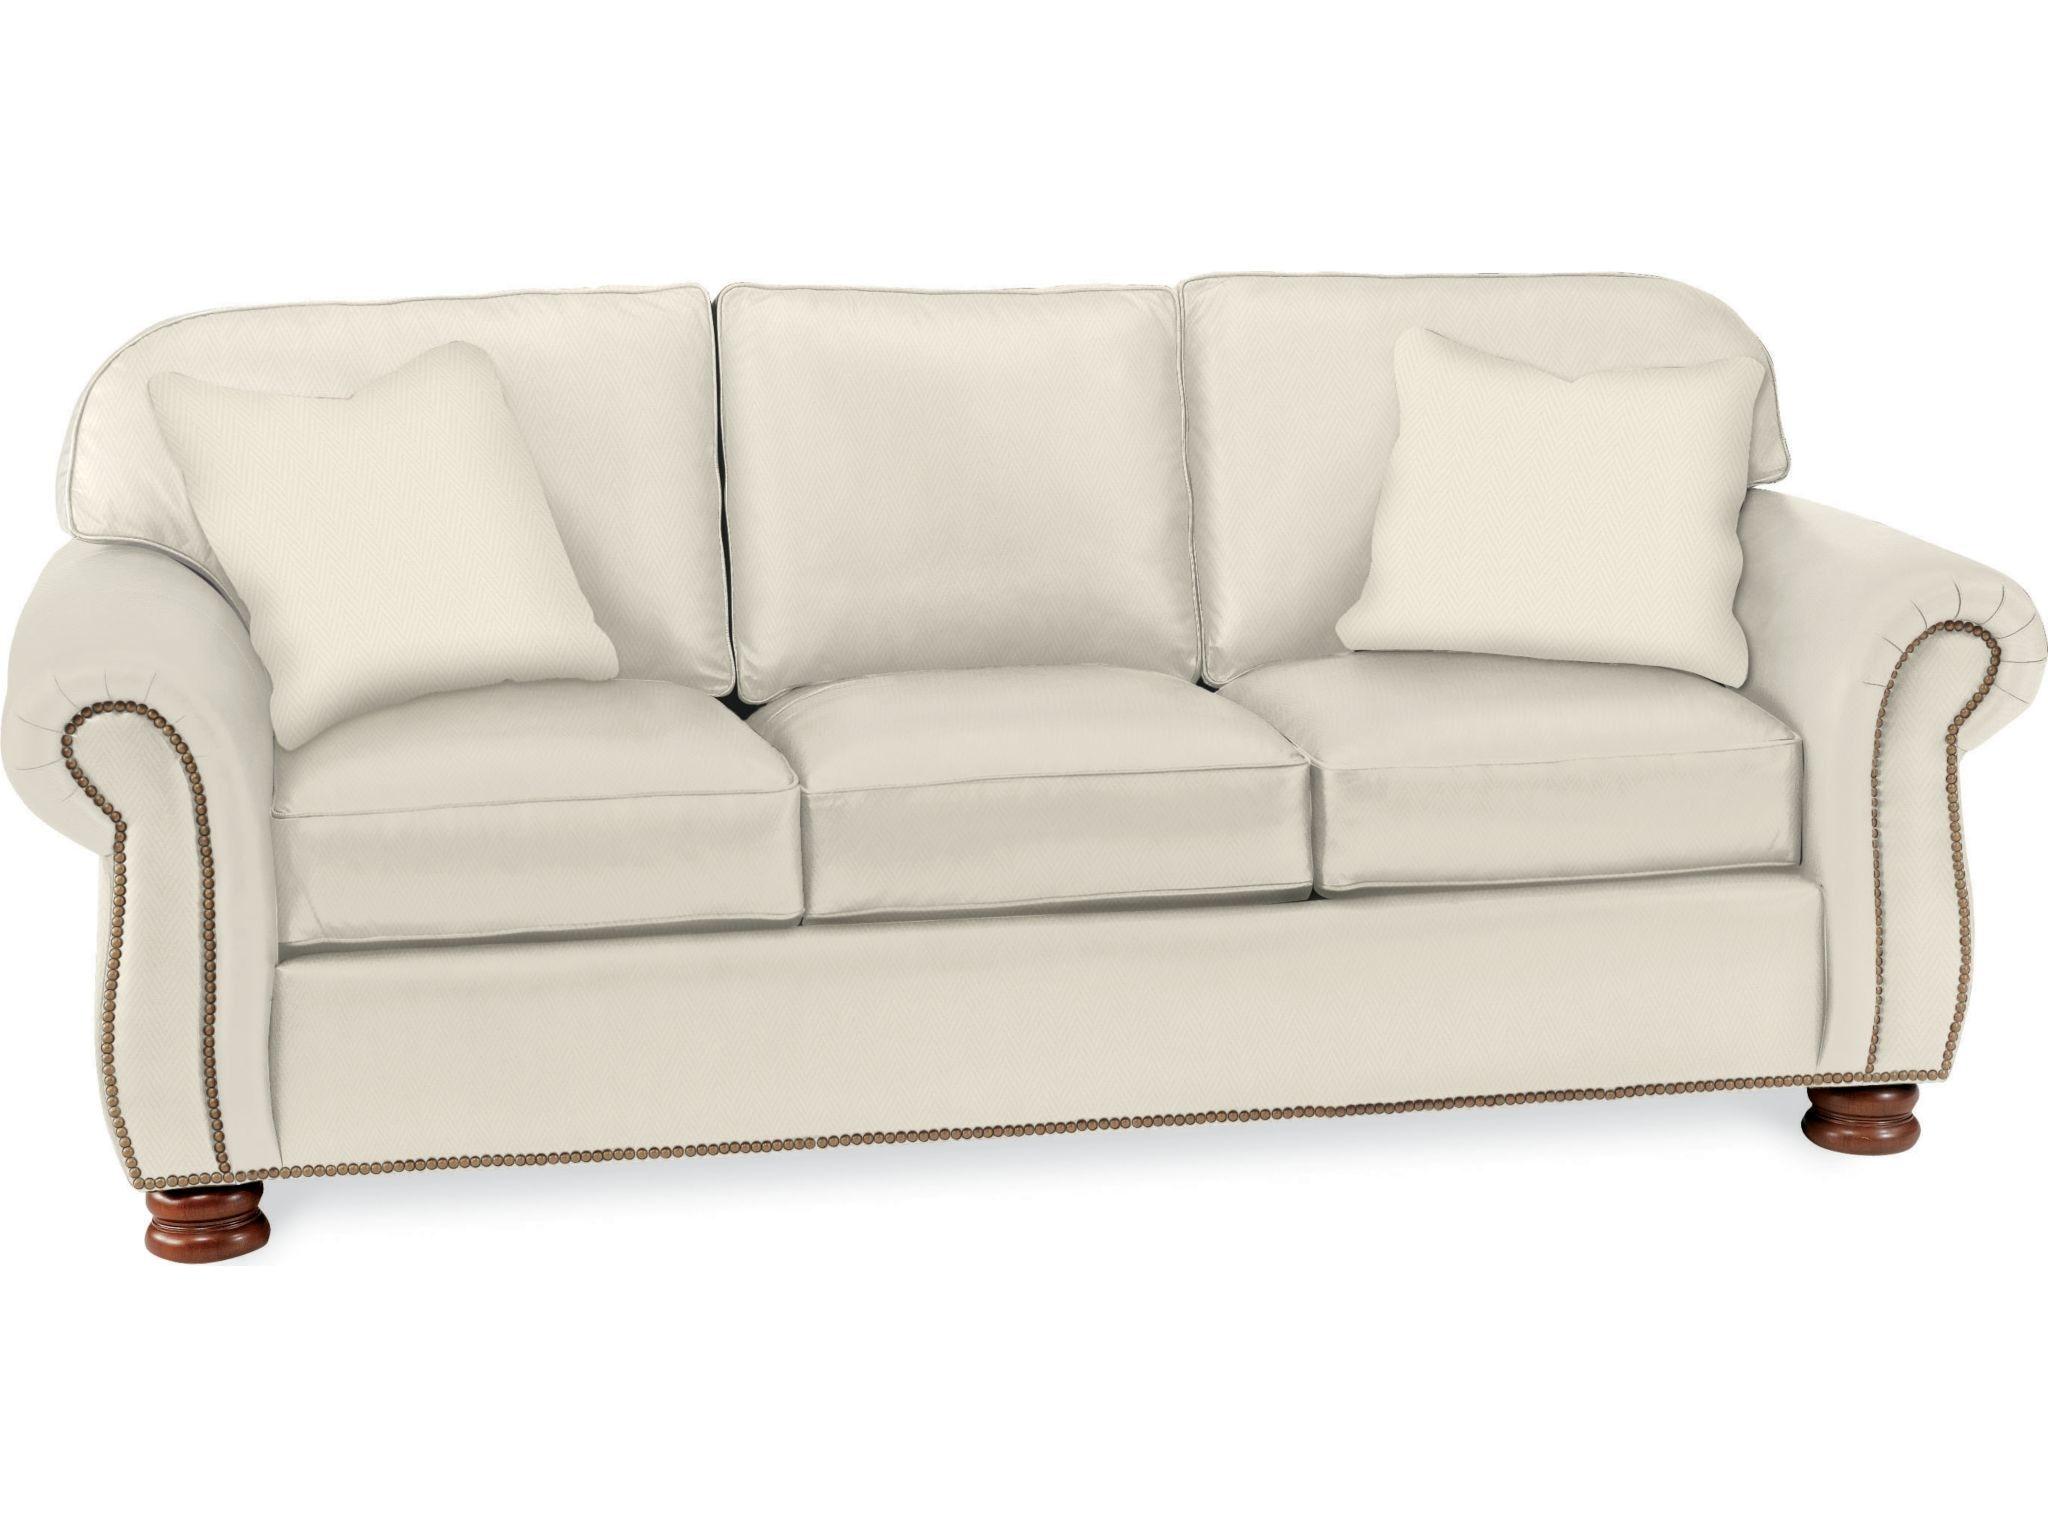 Thomasville Benjamin 3 Seat Sofa THV146131 From Walter E. Smithe Furniture  + Design